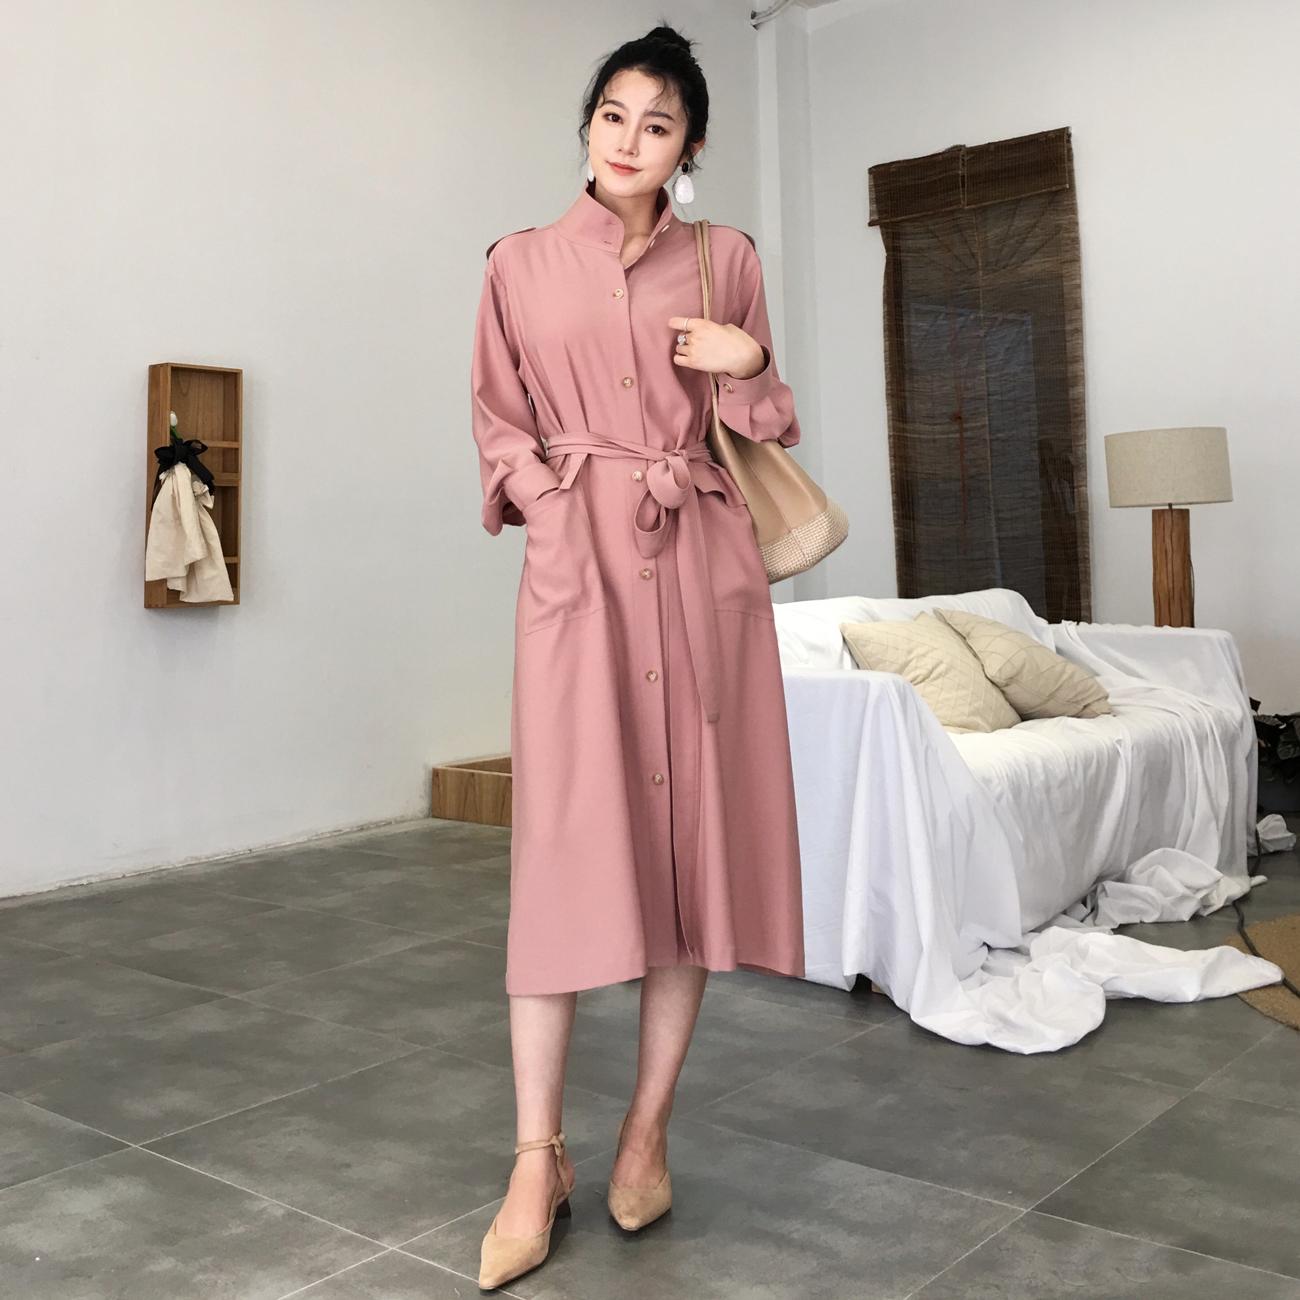 ◆ASM◆2018秋季新品气质显瘦收腰风衣长袖立领中长款外套女薄款